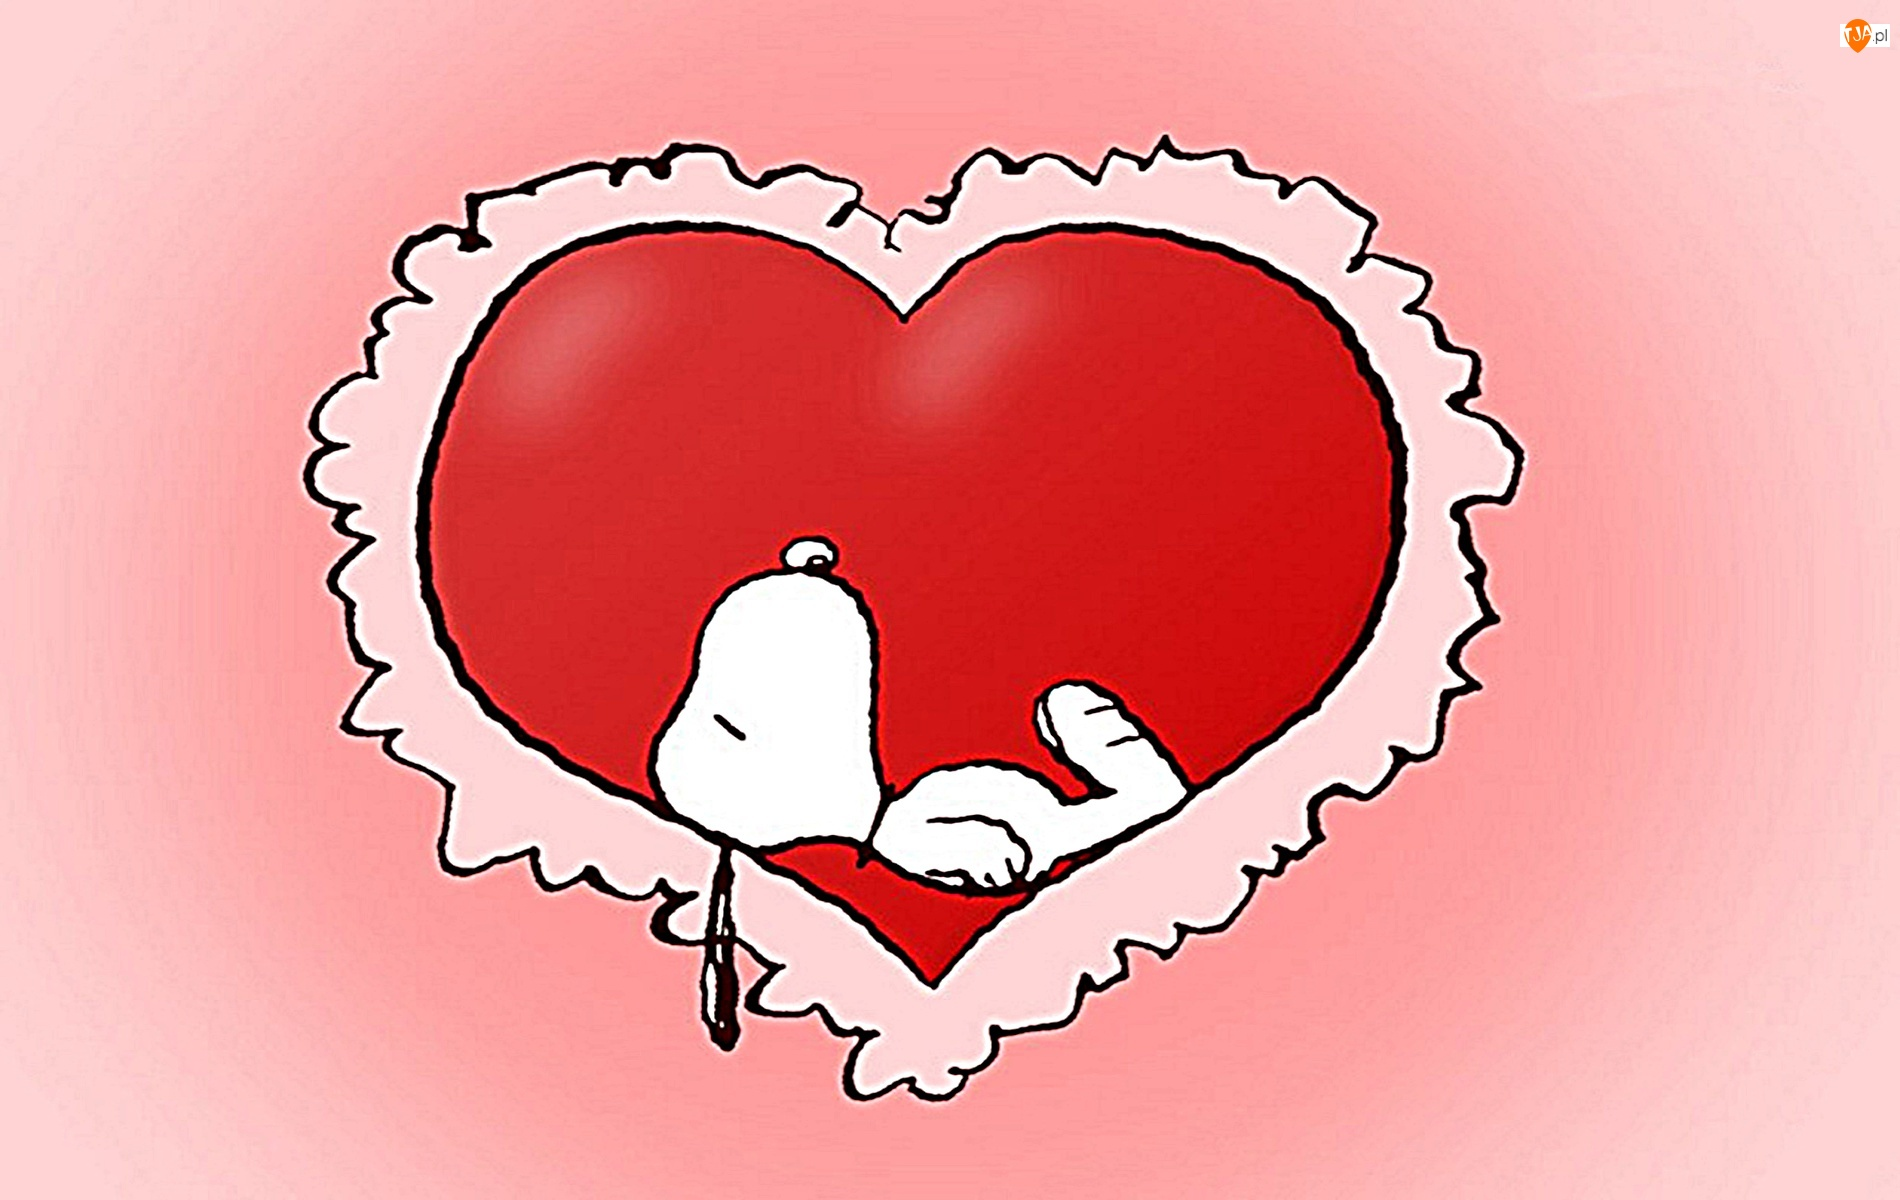 serce, Snoopy, kreskówka